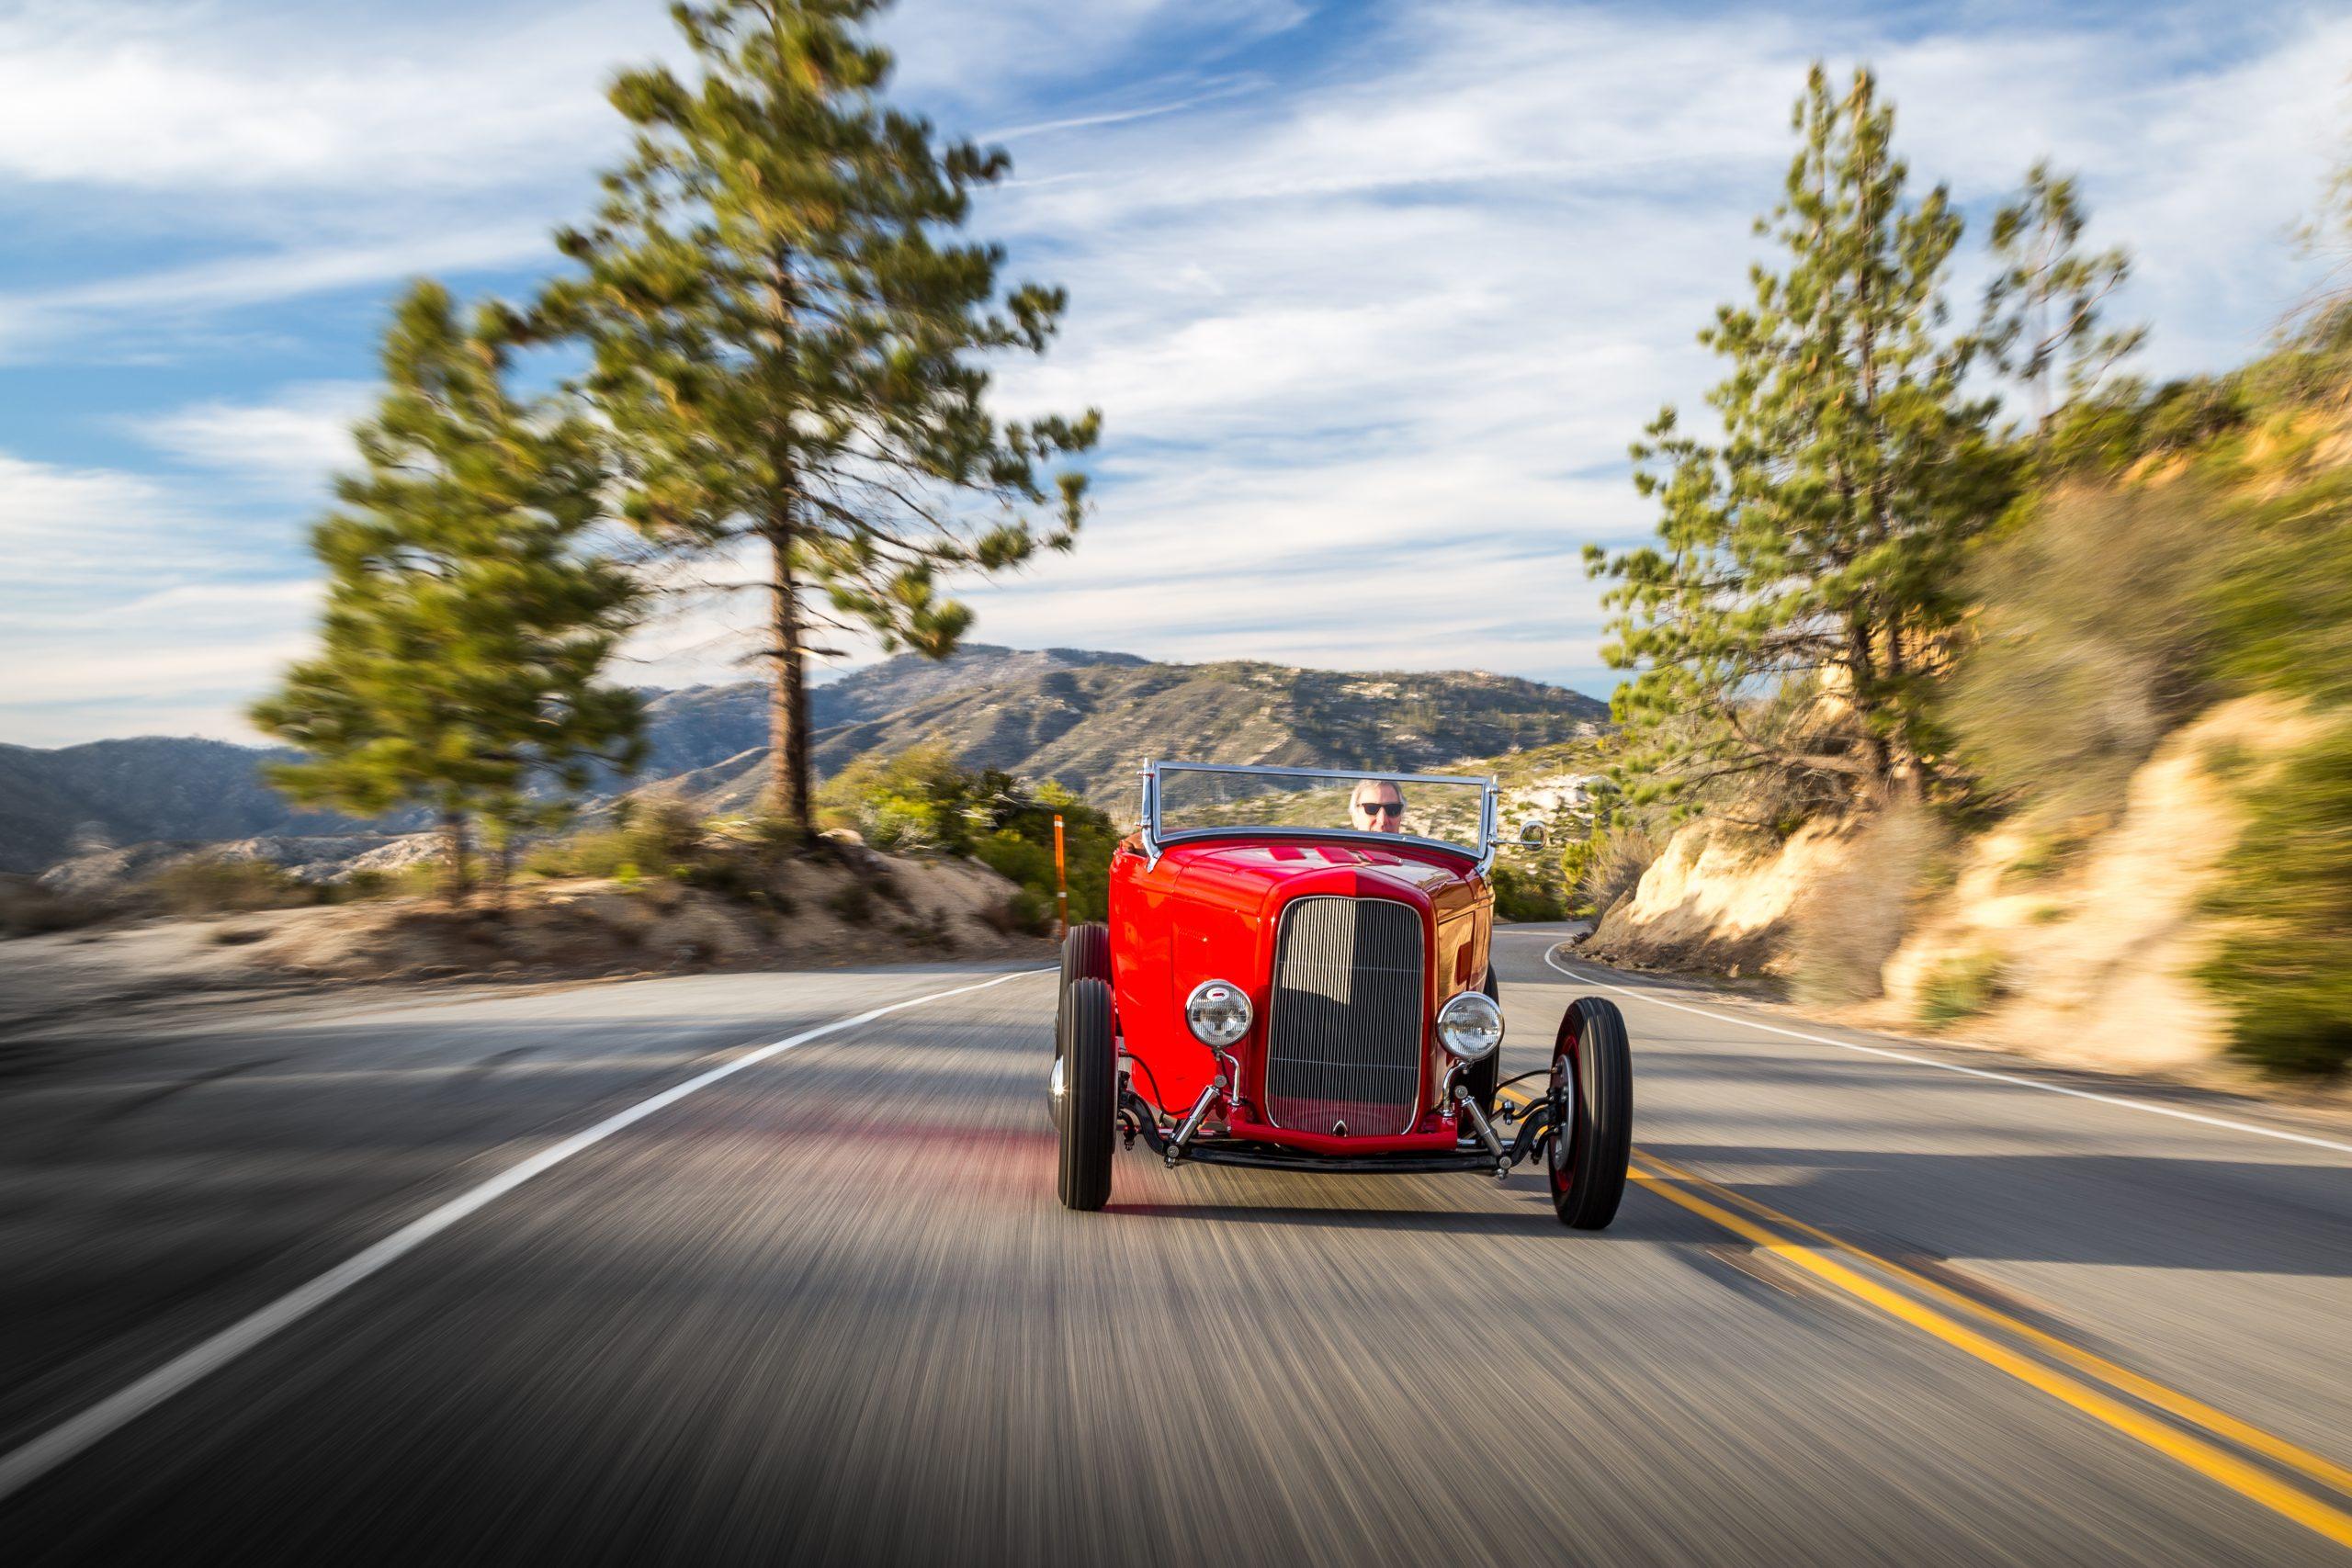 McGee Roadster - 1932 Ford - HVA - Driving 1